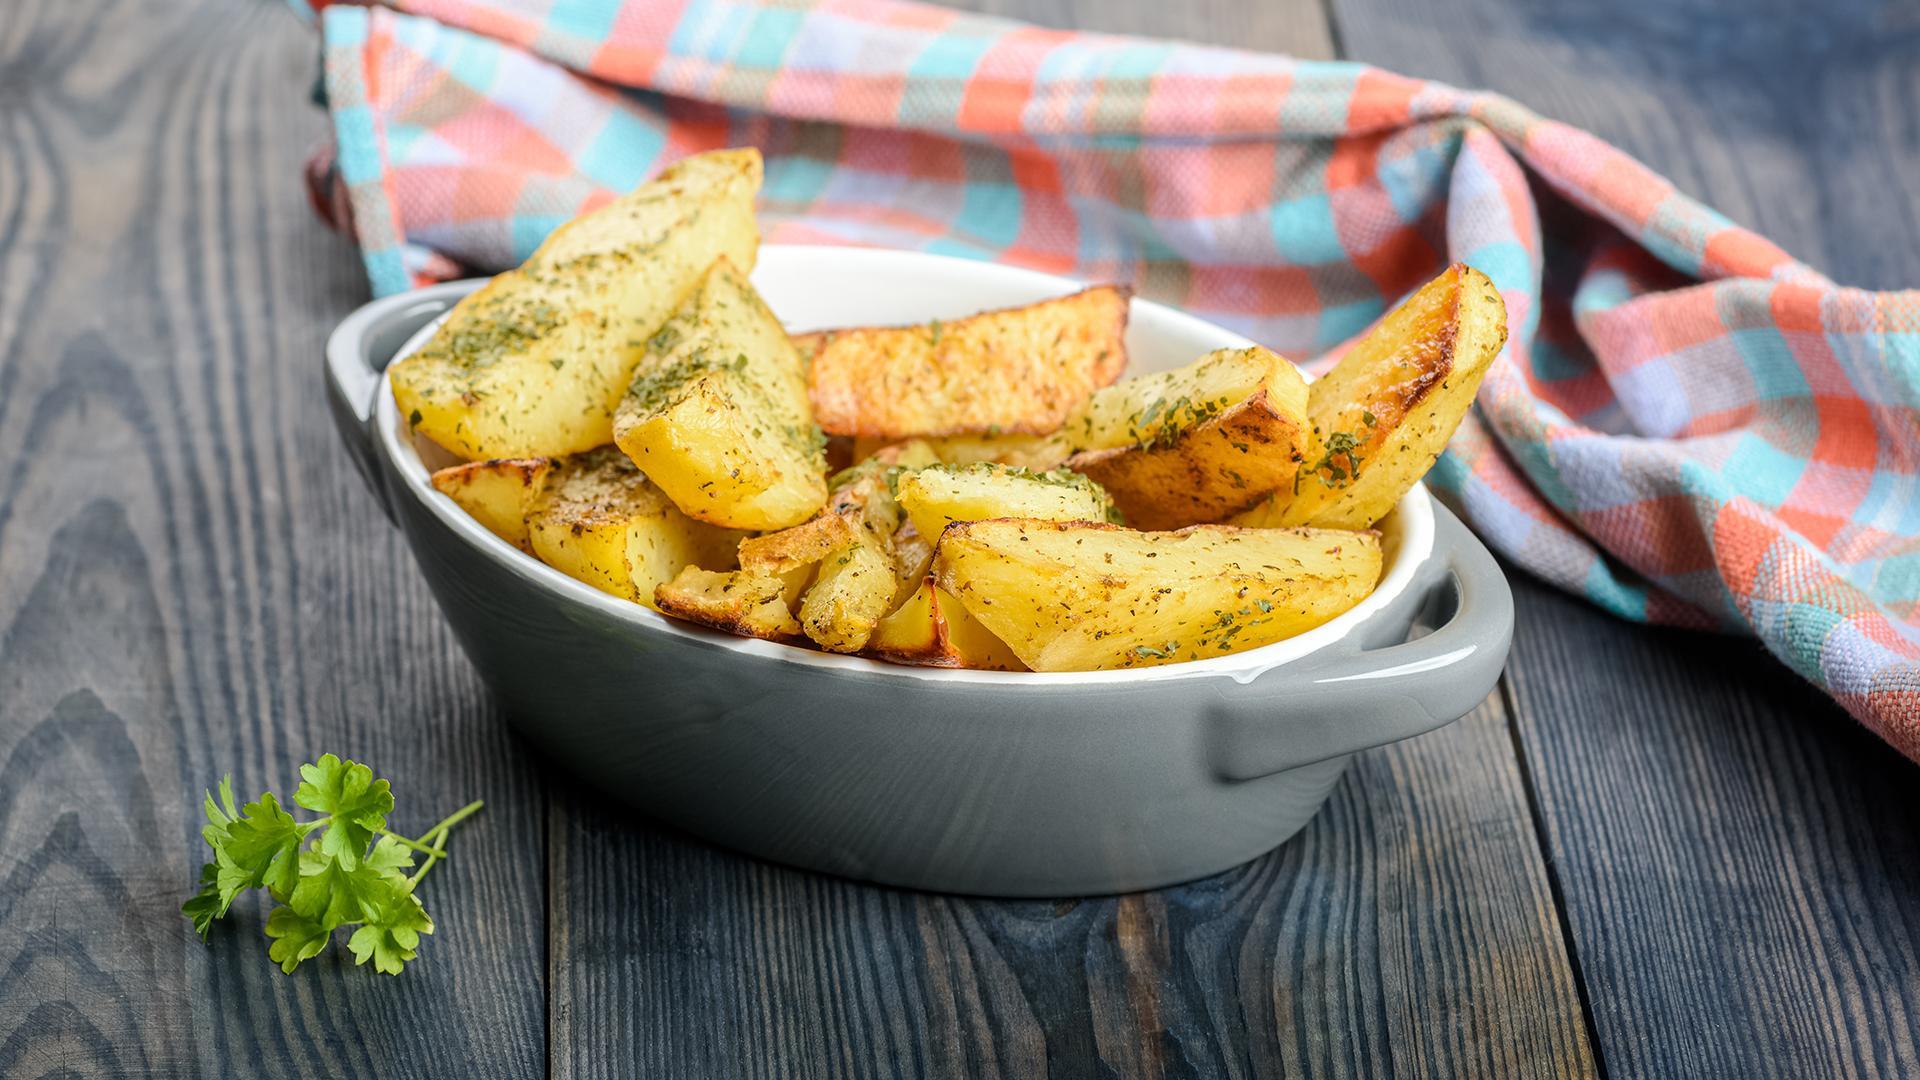 Roasted Potato Sticks with Rosemary